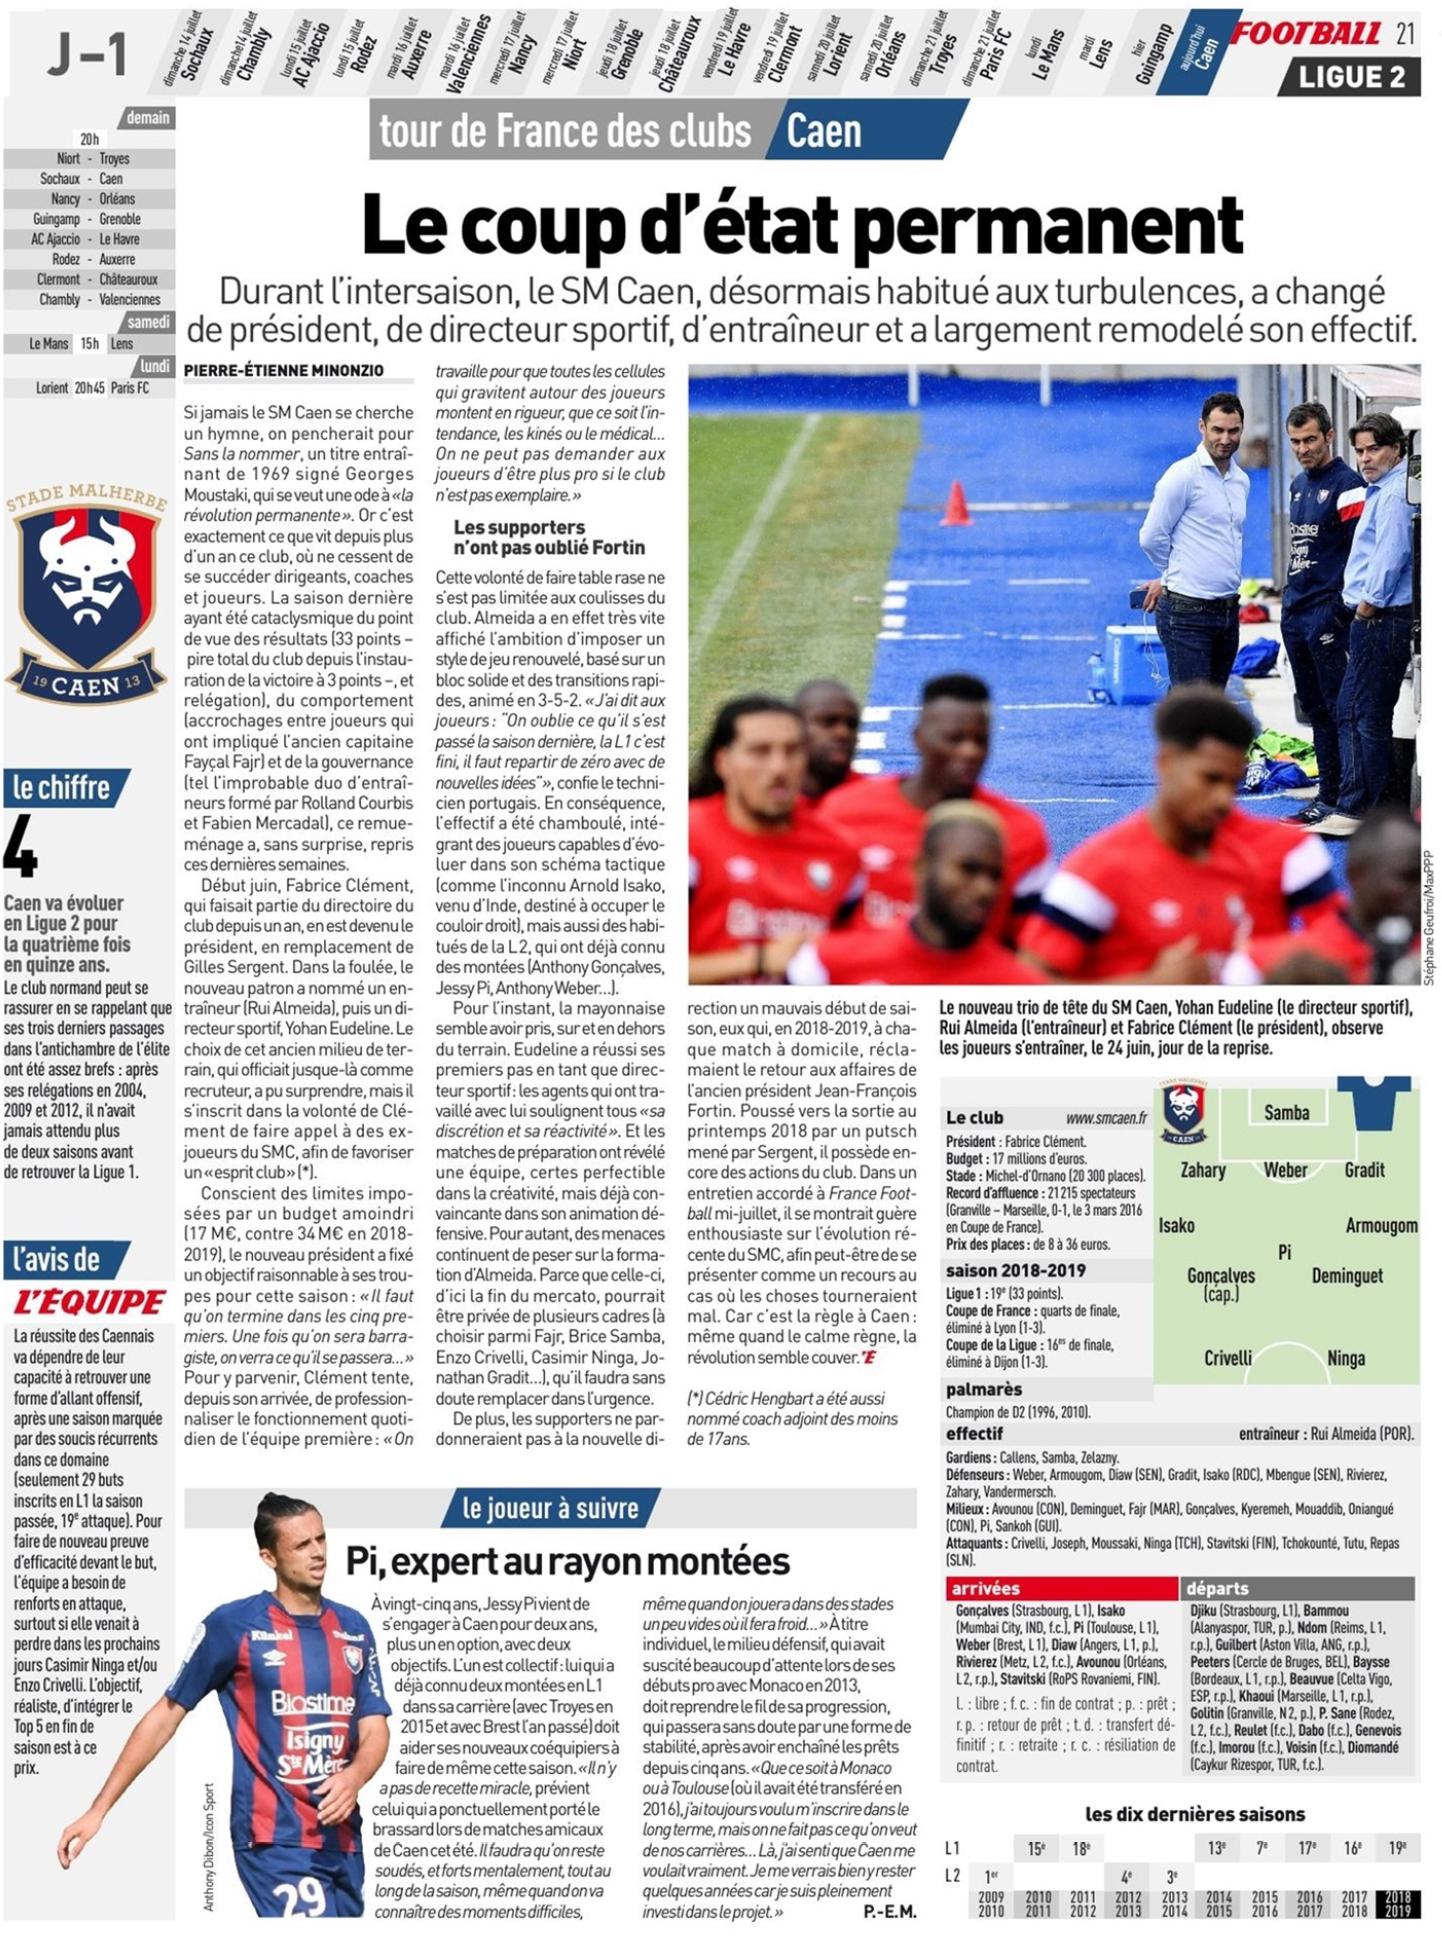 [2019/2020]Revue de presse - Page 3 190725124605711043